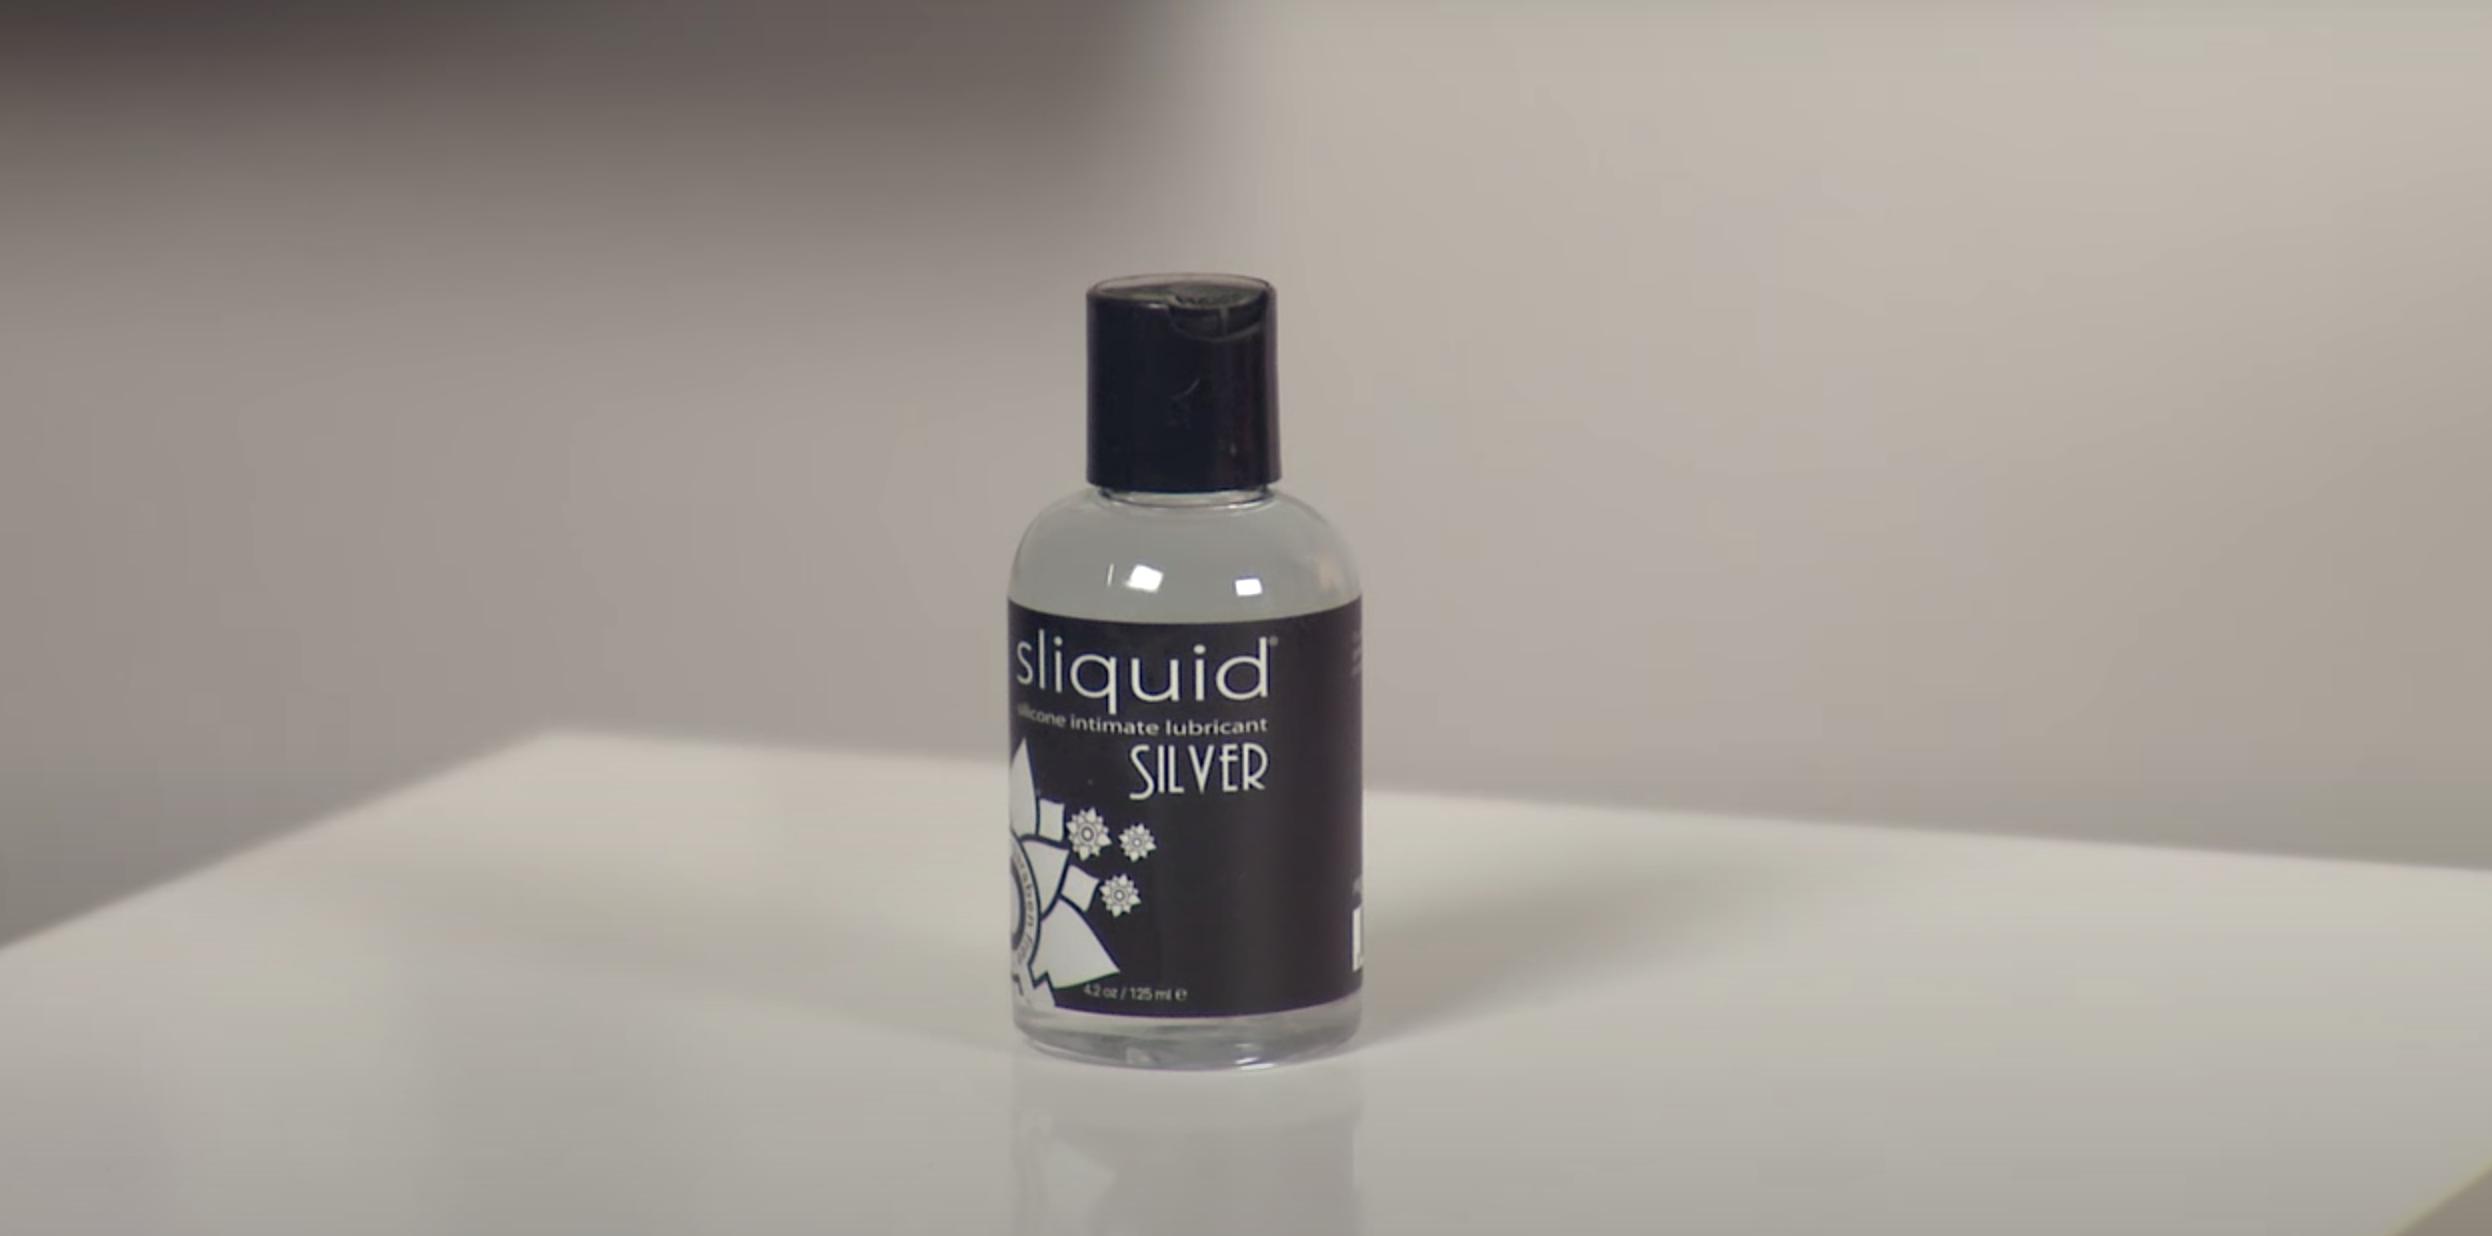 best lubrication for masturbating